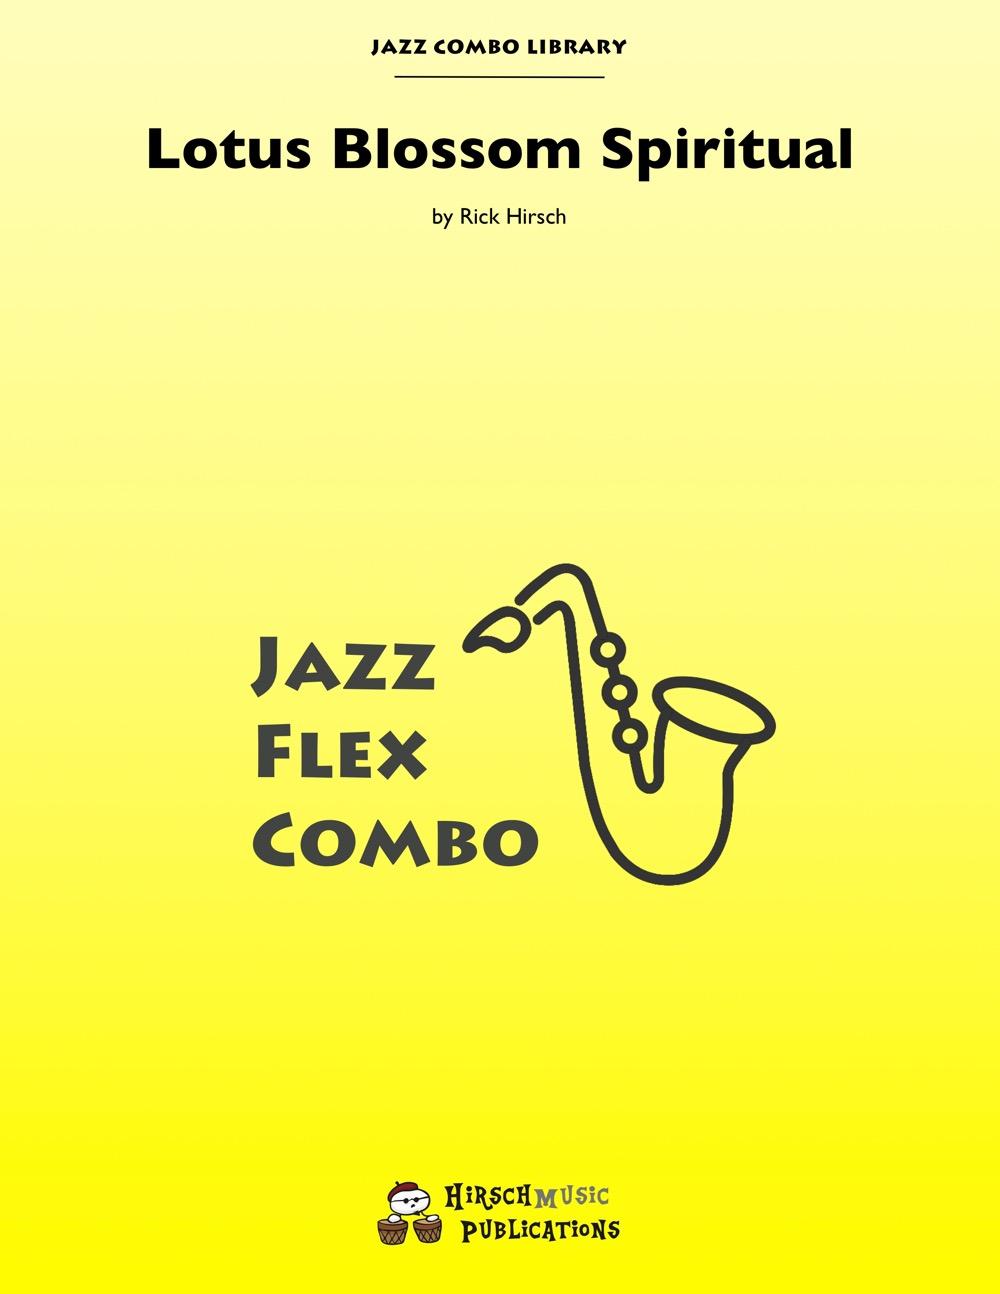 Lotus Blossom Spiritual (Jazz Combo)